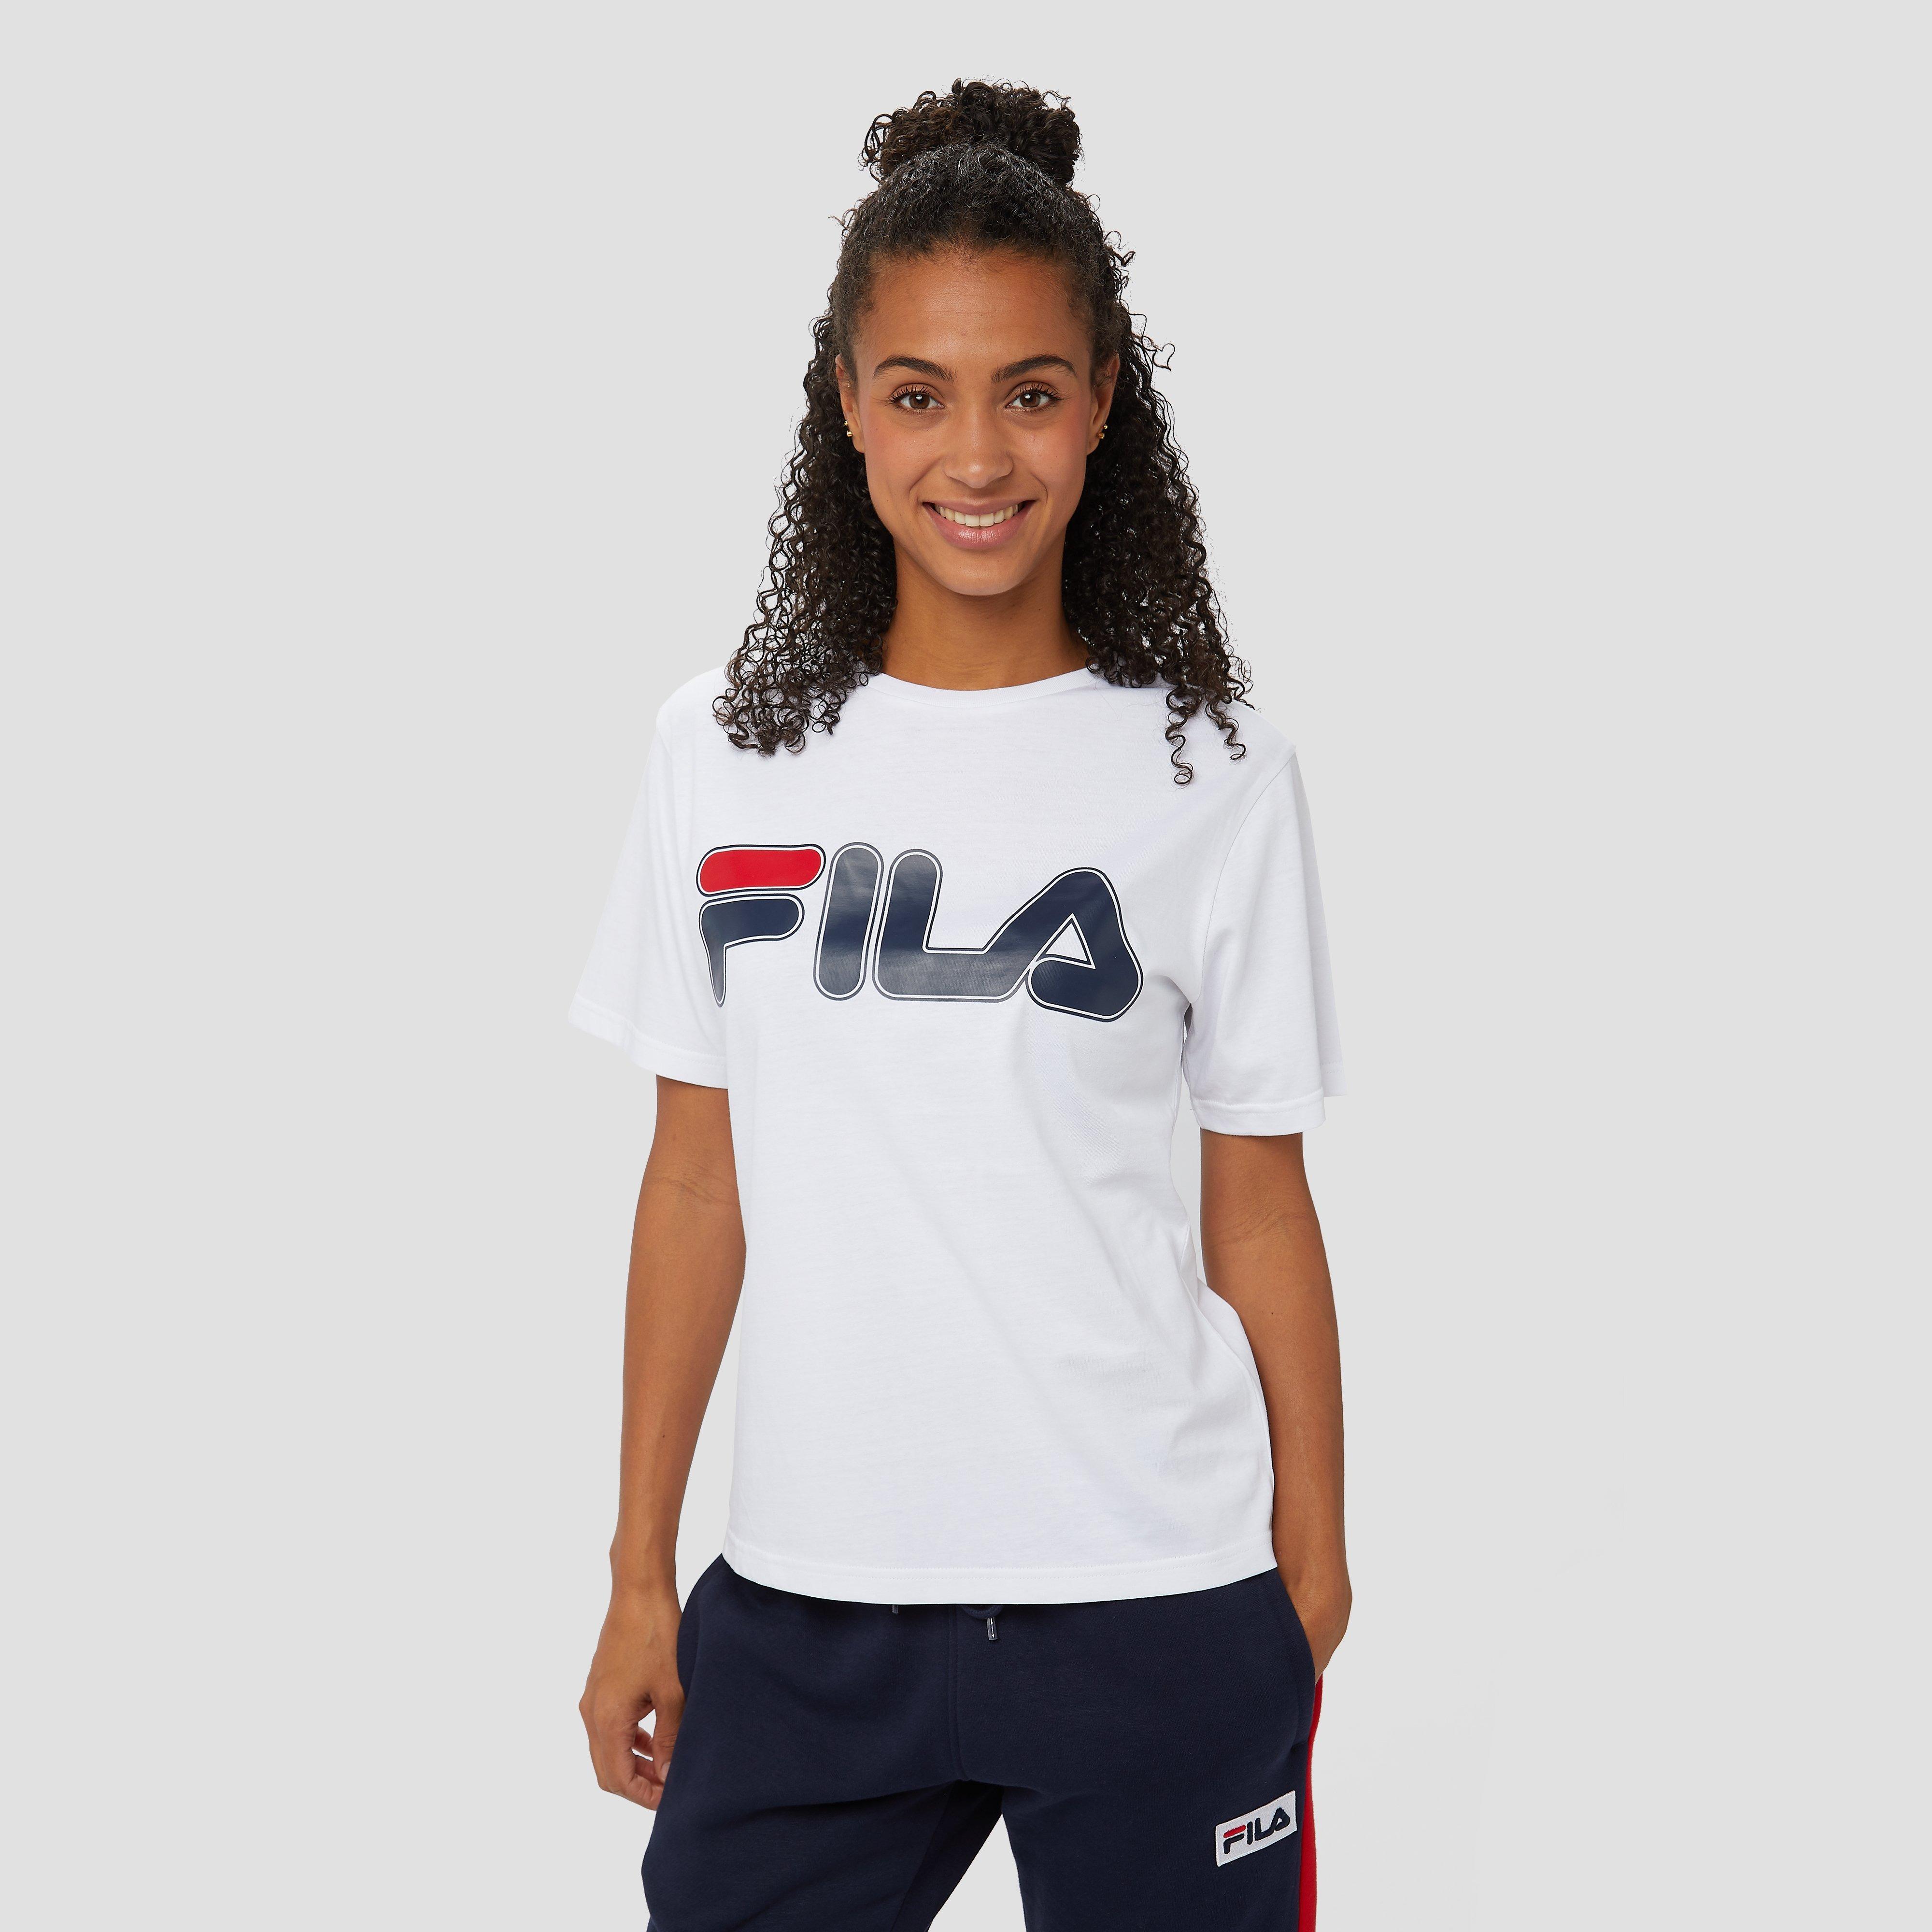 FILA GIULIA SHIRT WIT DAMES   Aktiesport